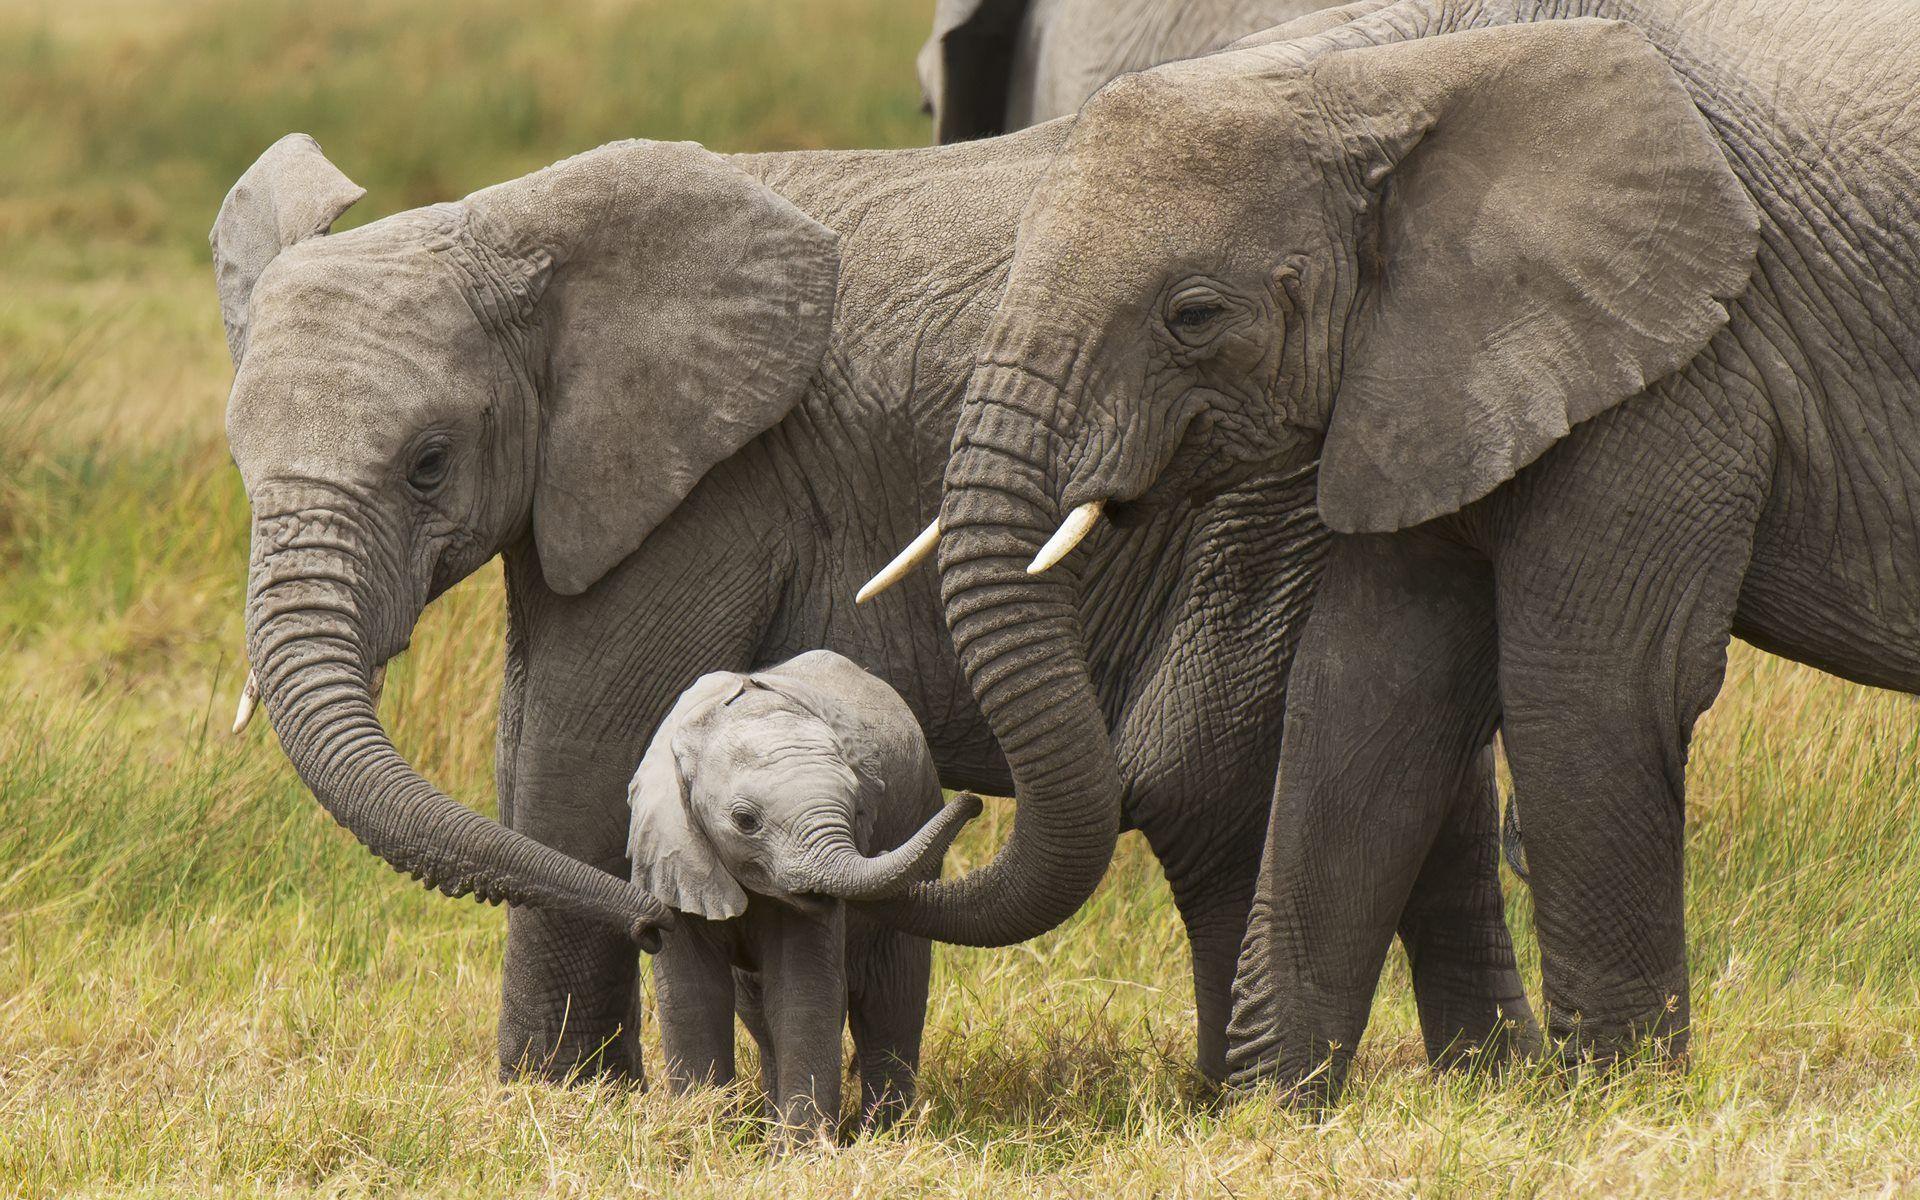 Cute baby elephant wallpapers hd disney elephant - Baby elephant wallpaper ...